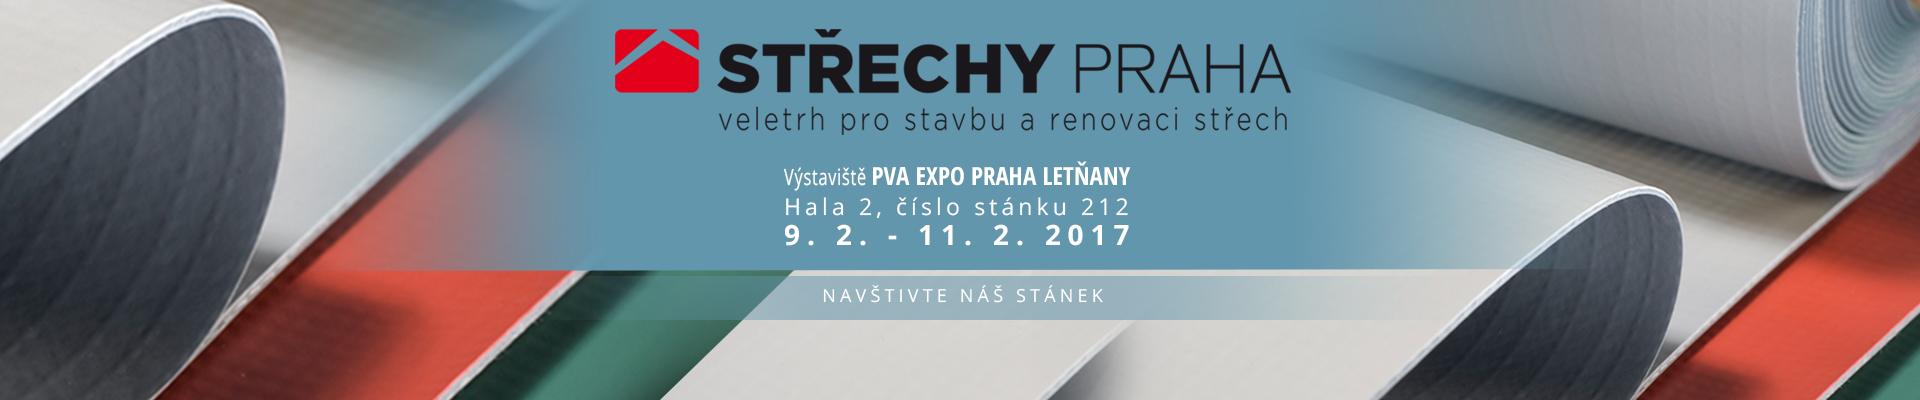 Baner Střechy Praha